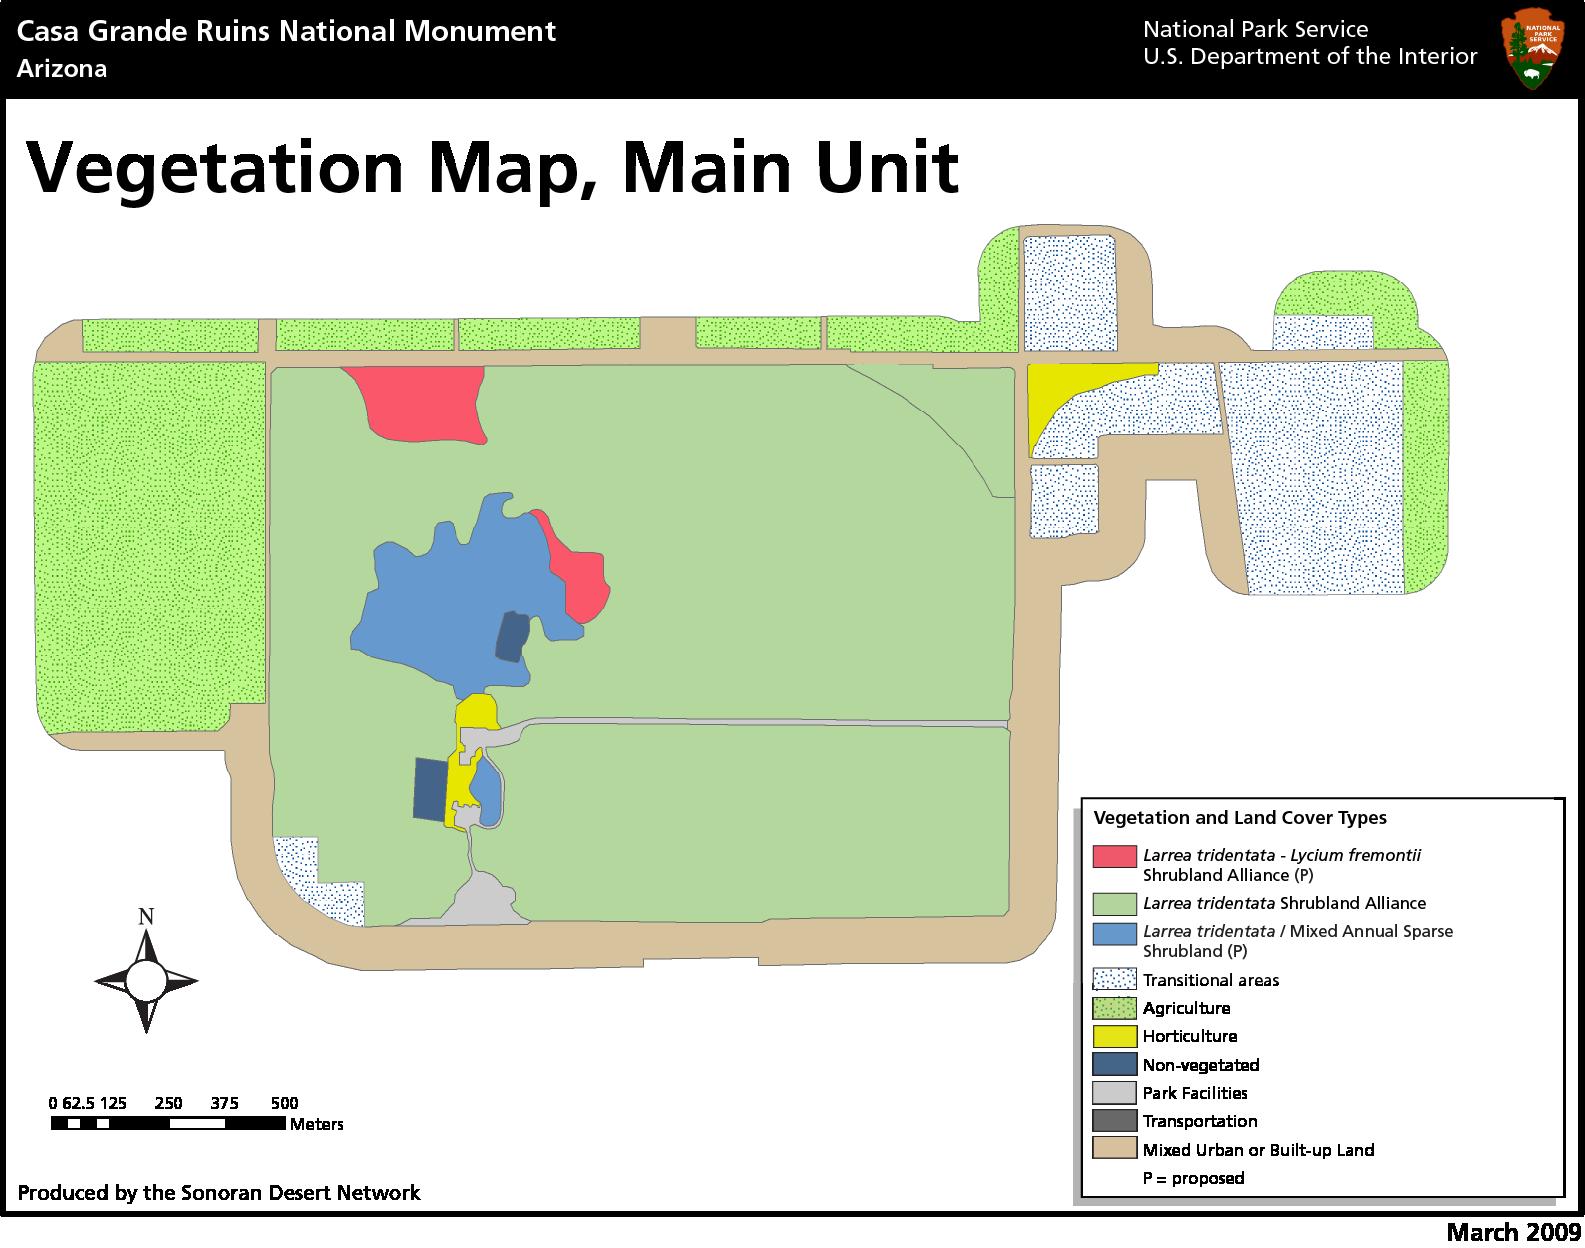 Status and Trends of Vegetation and Soils at Casa Grande Ruins